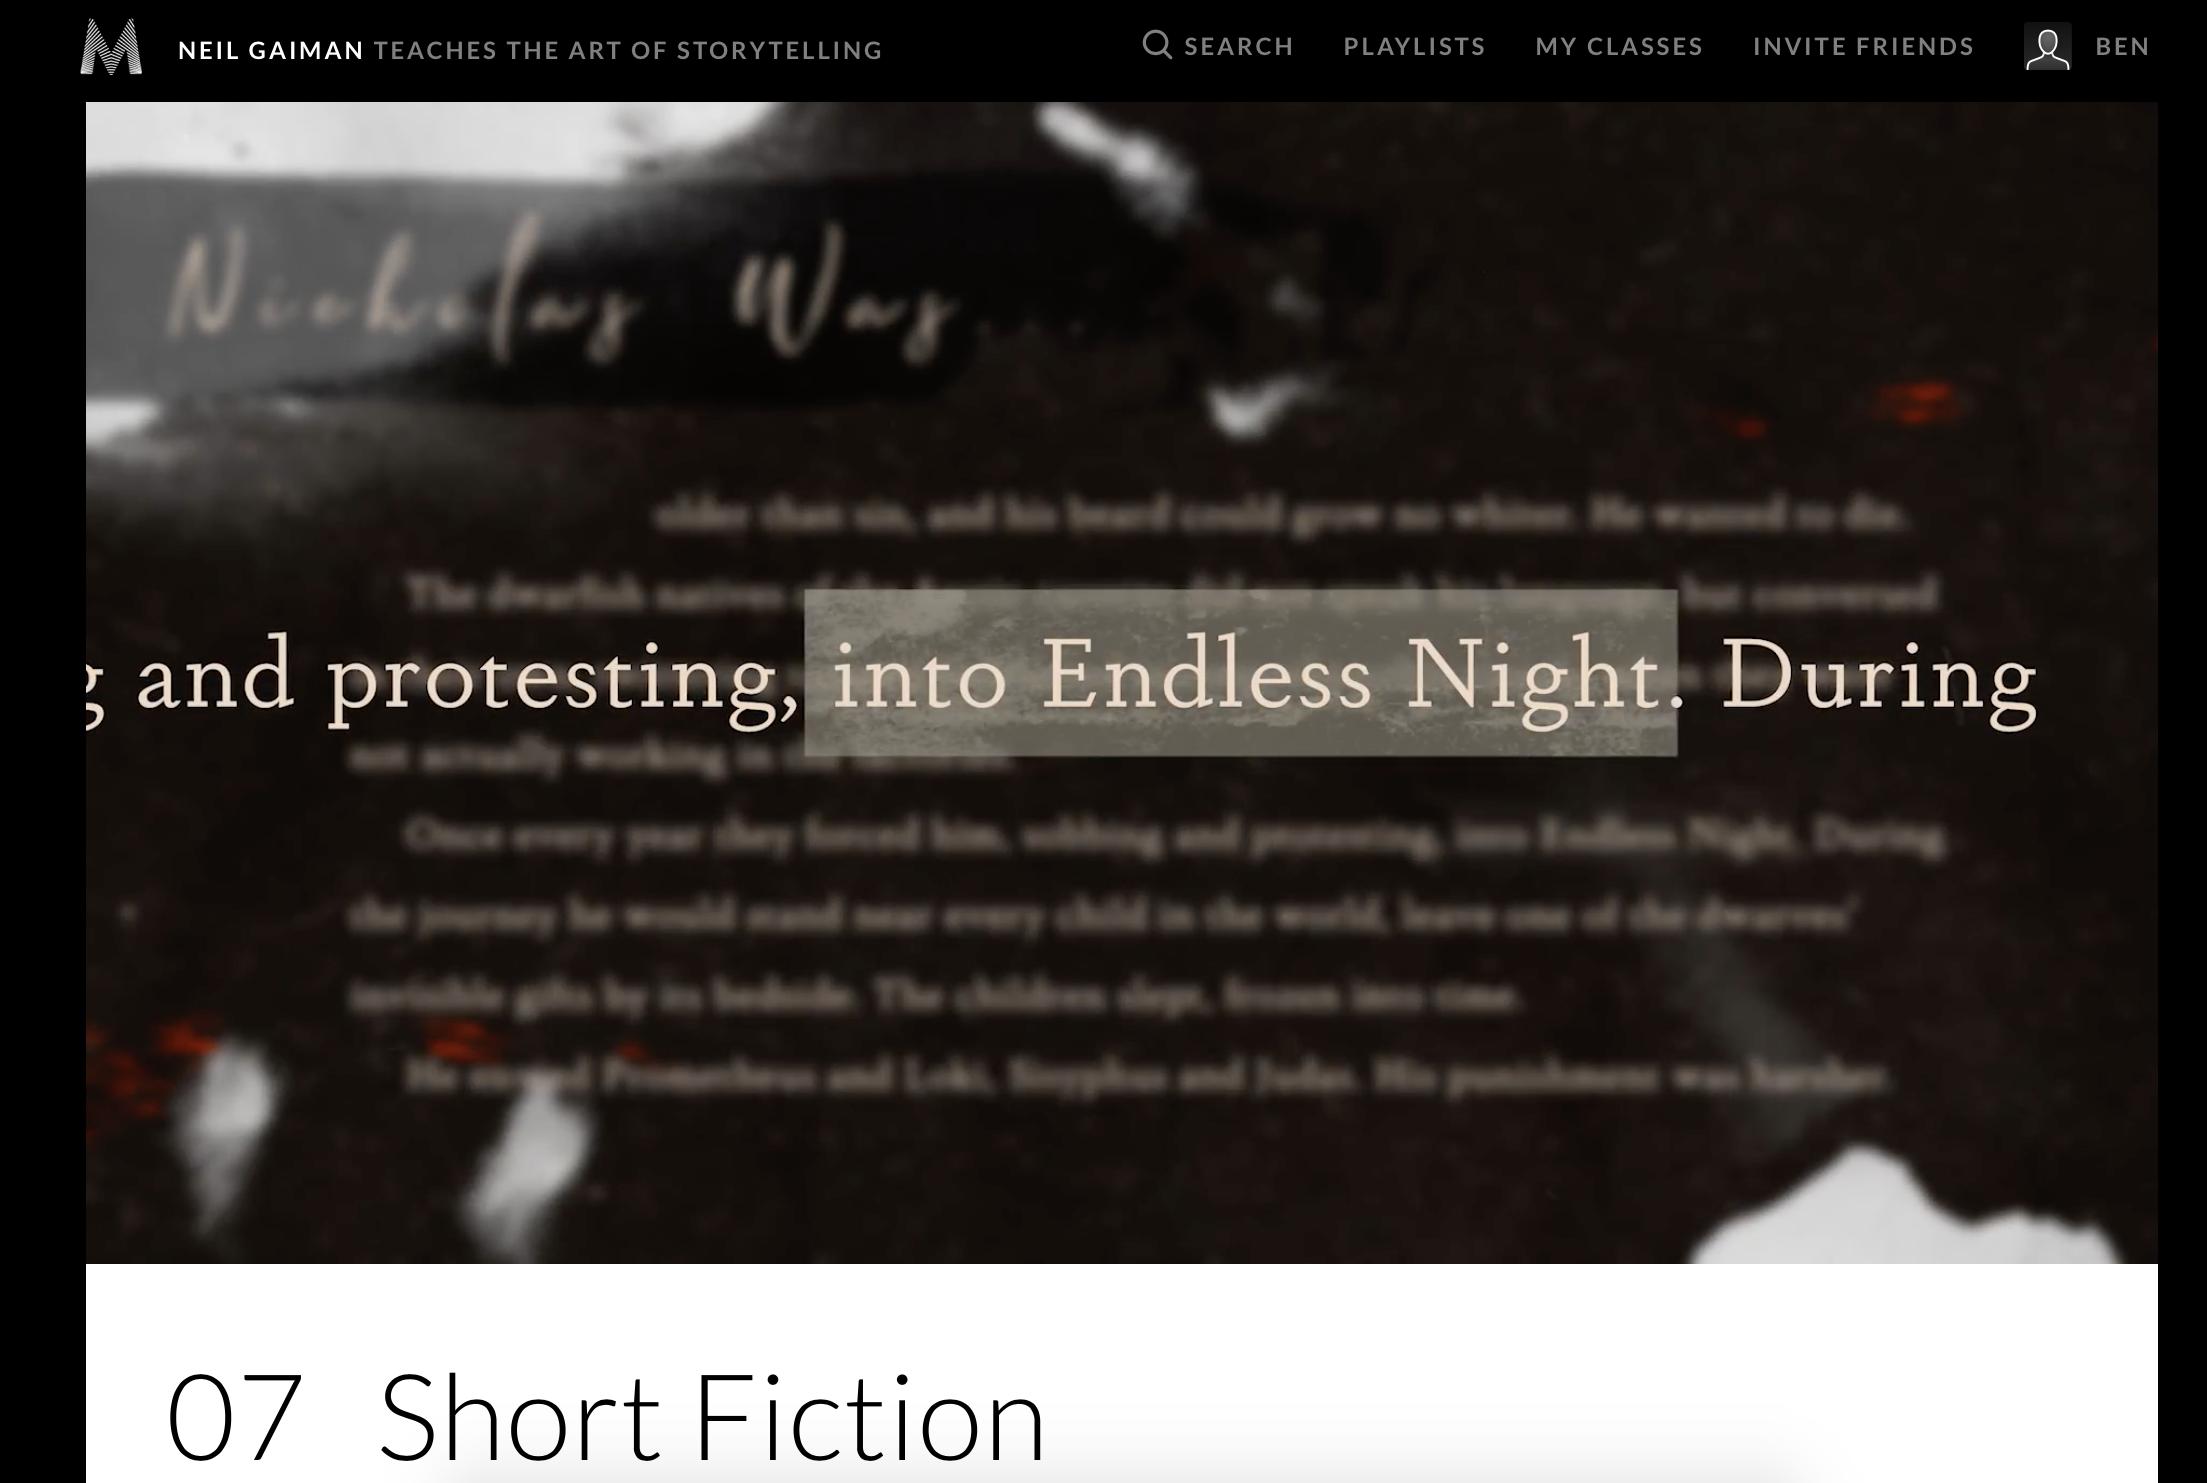 Neil Gaiman Teaches the Art of Storytelling MasterClass Review